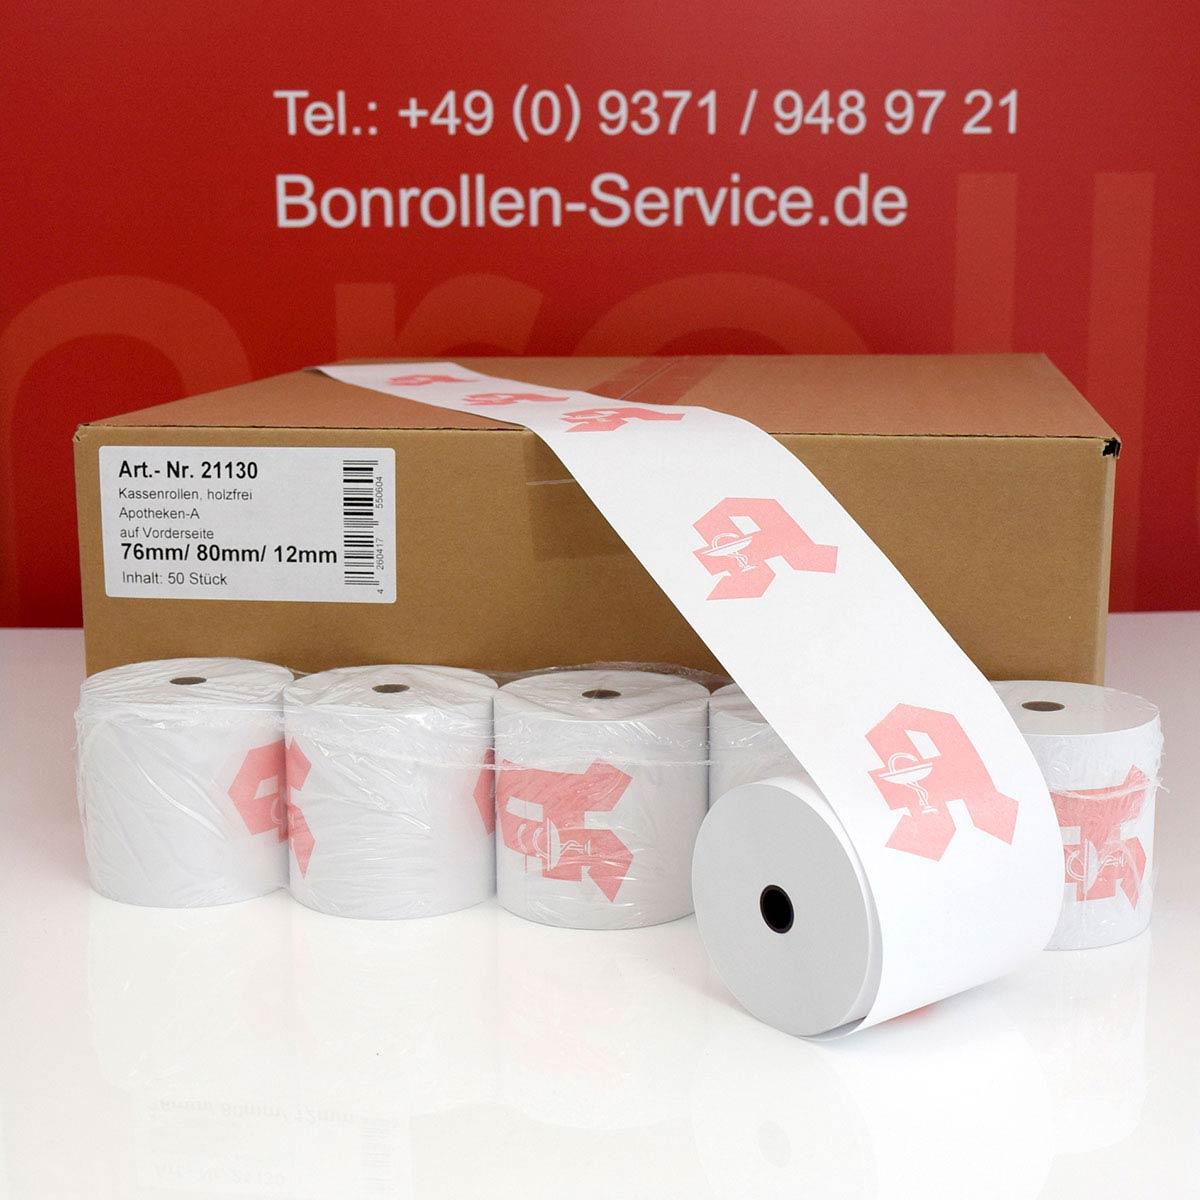 Apothekenrollen 76 / 80 / 12 weiß, Normalpapier